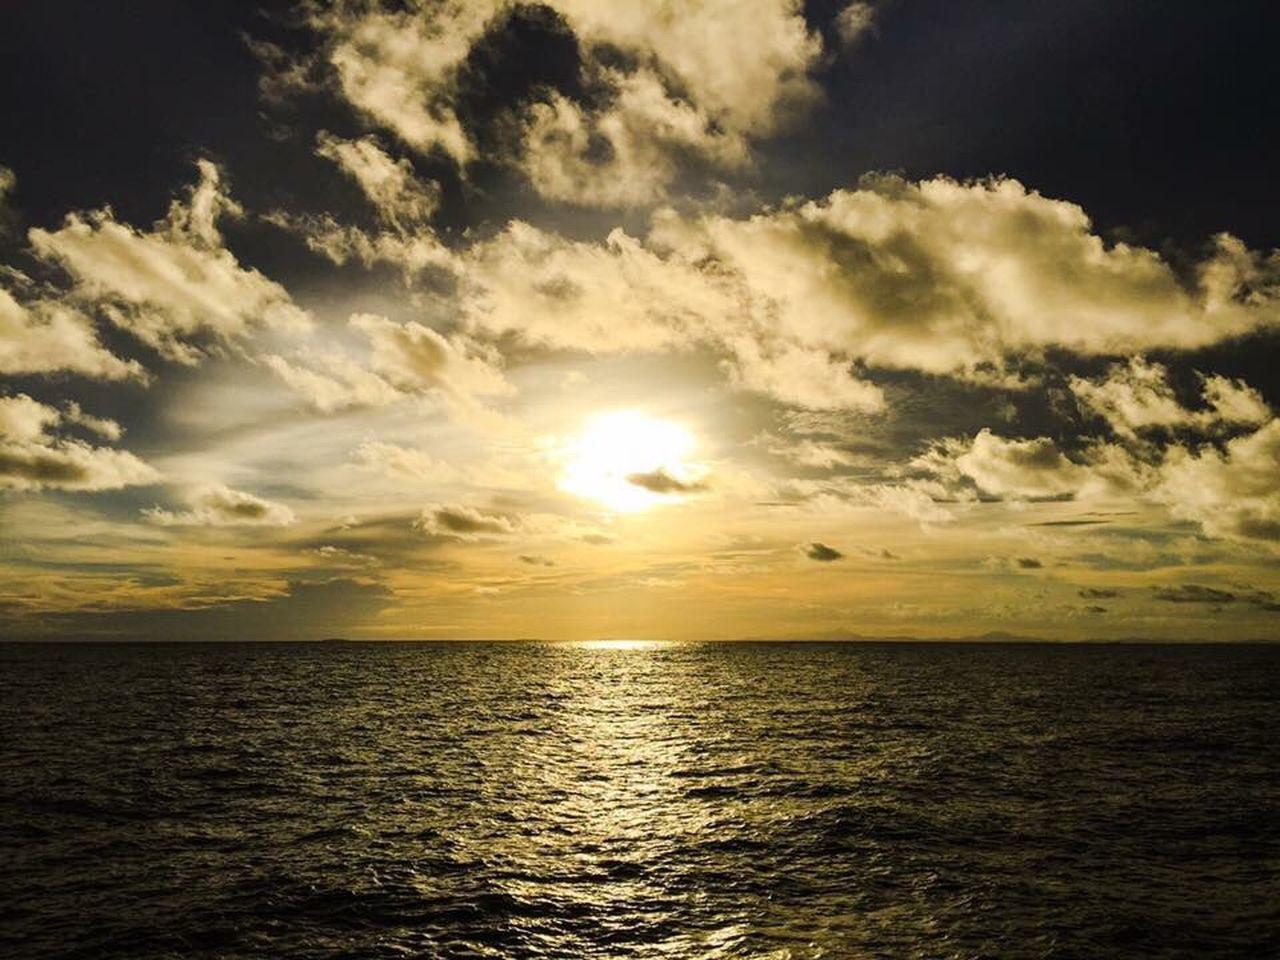 sea, freedom, sunset, idyllic, sun, beauty in nature, tranquil scene, scenics, sunbeam, nature, tranquility, water, horizon over water, sunlight, no people, sky, landscape, outdoors